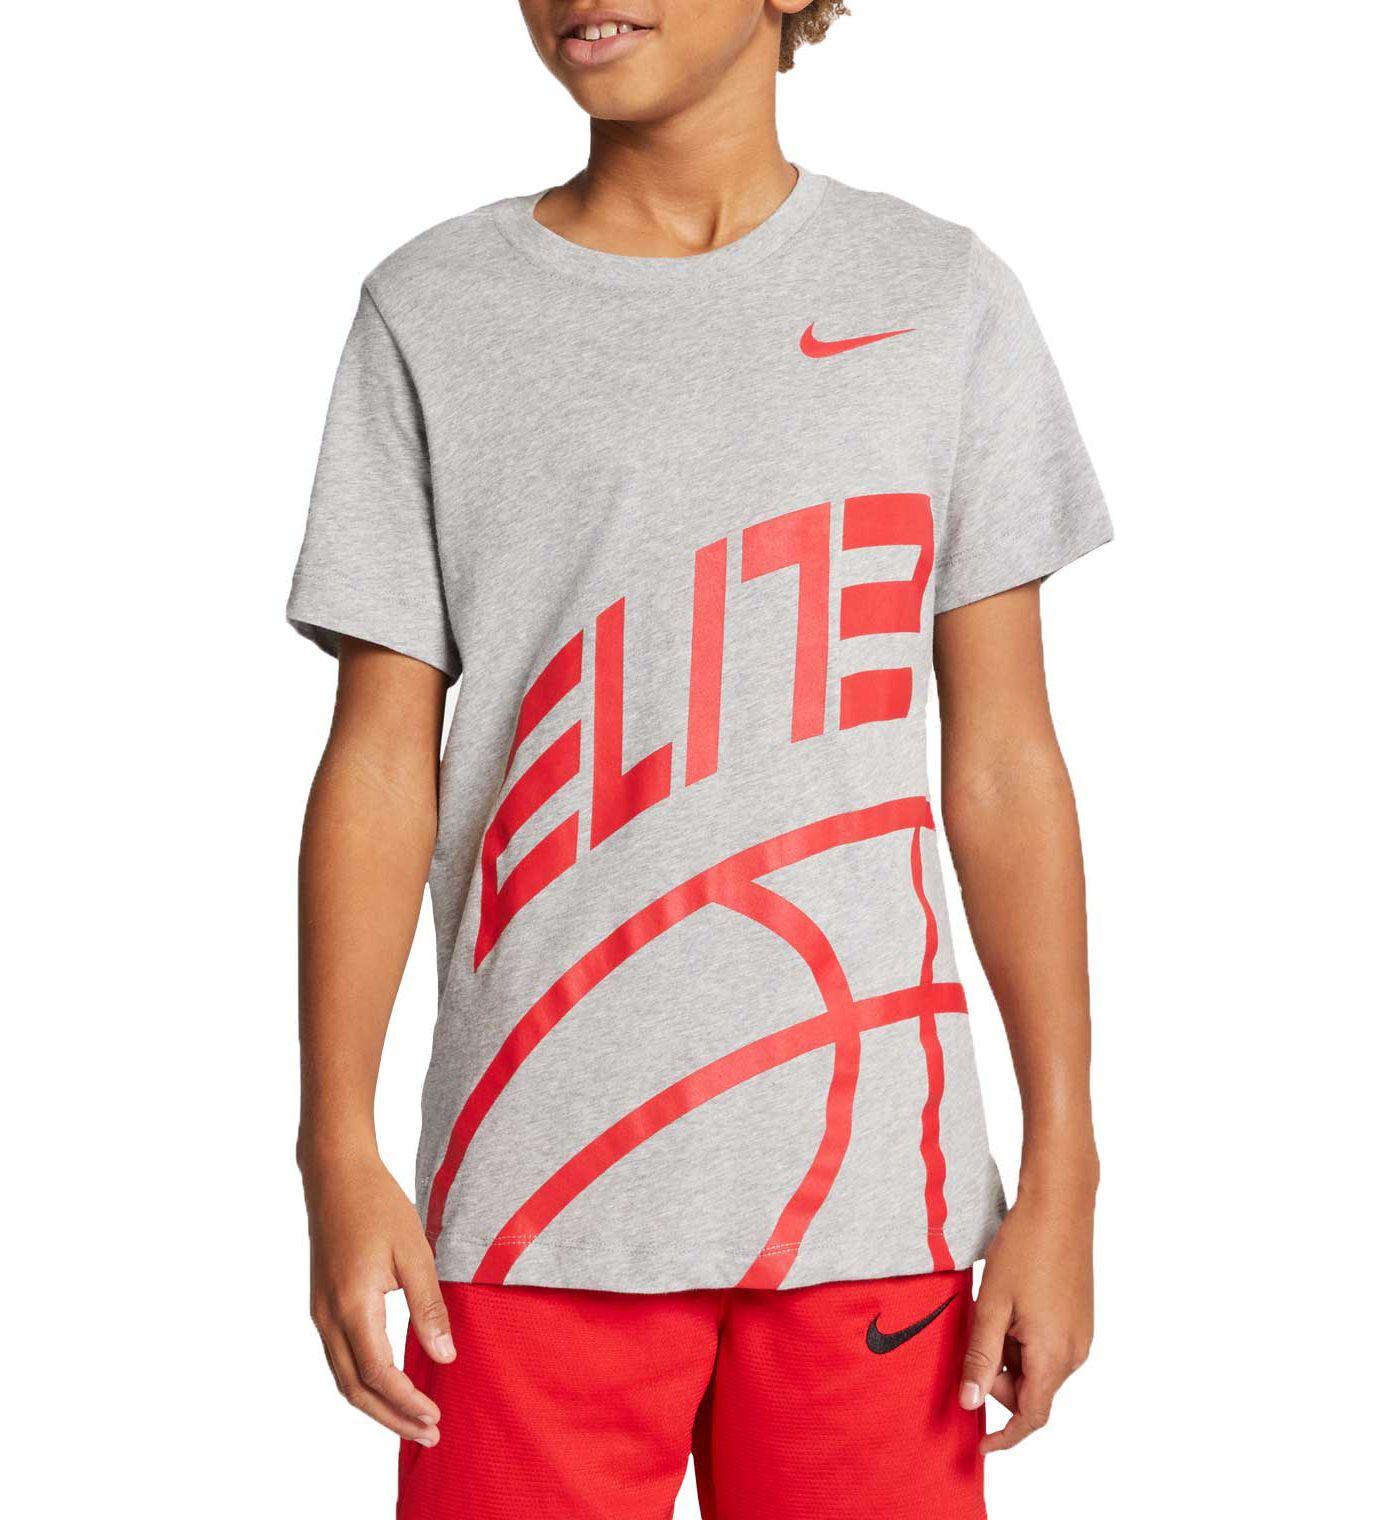 Nike Boys' Exclusive Dri-FIT Elite Graphic Tee